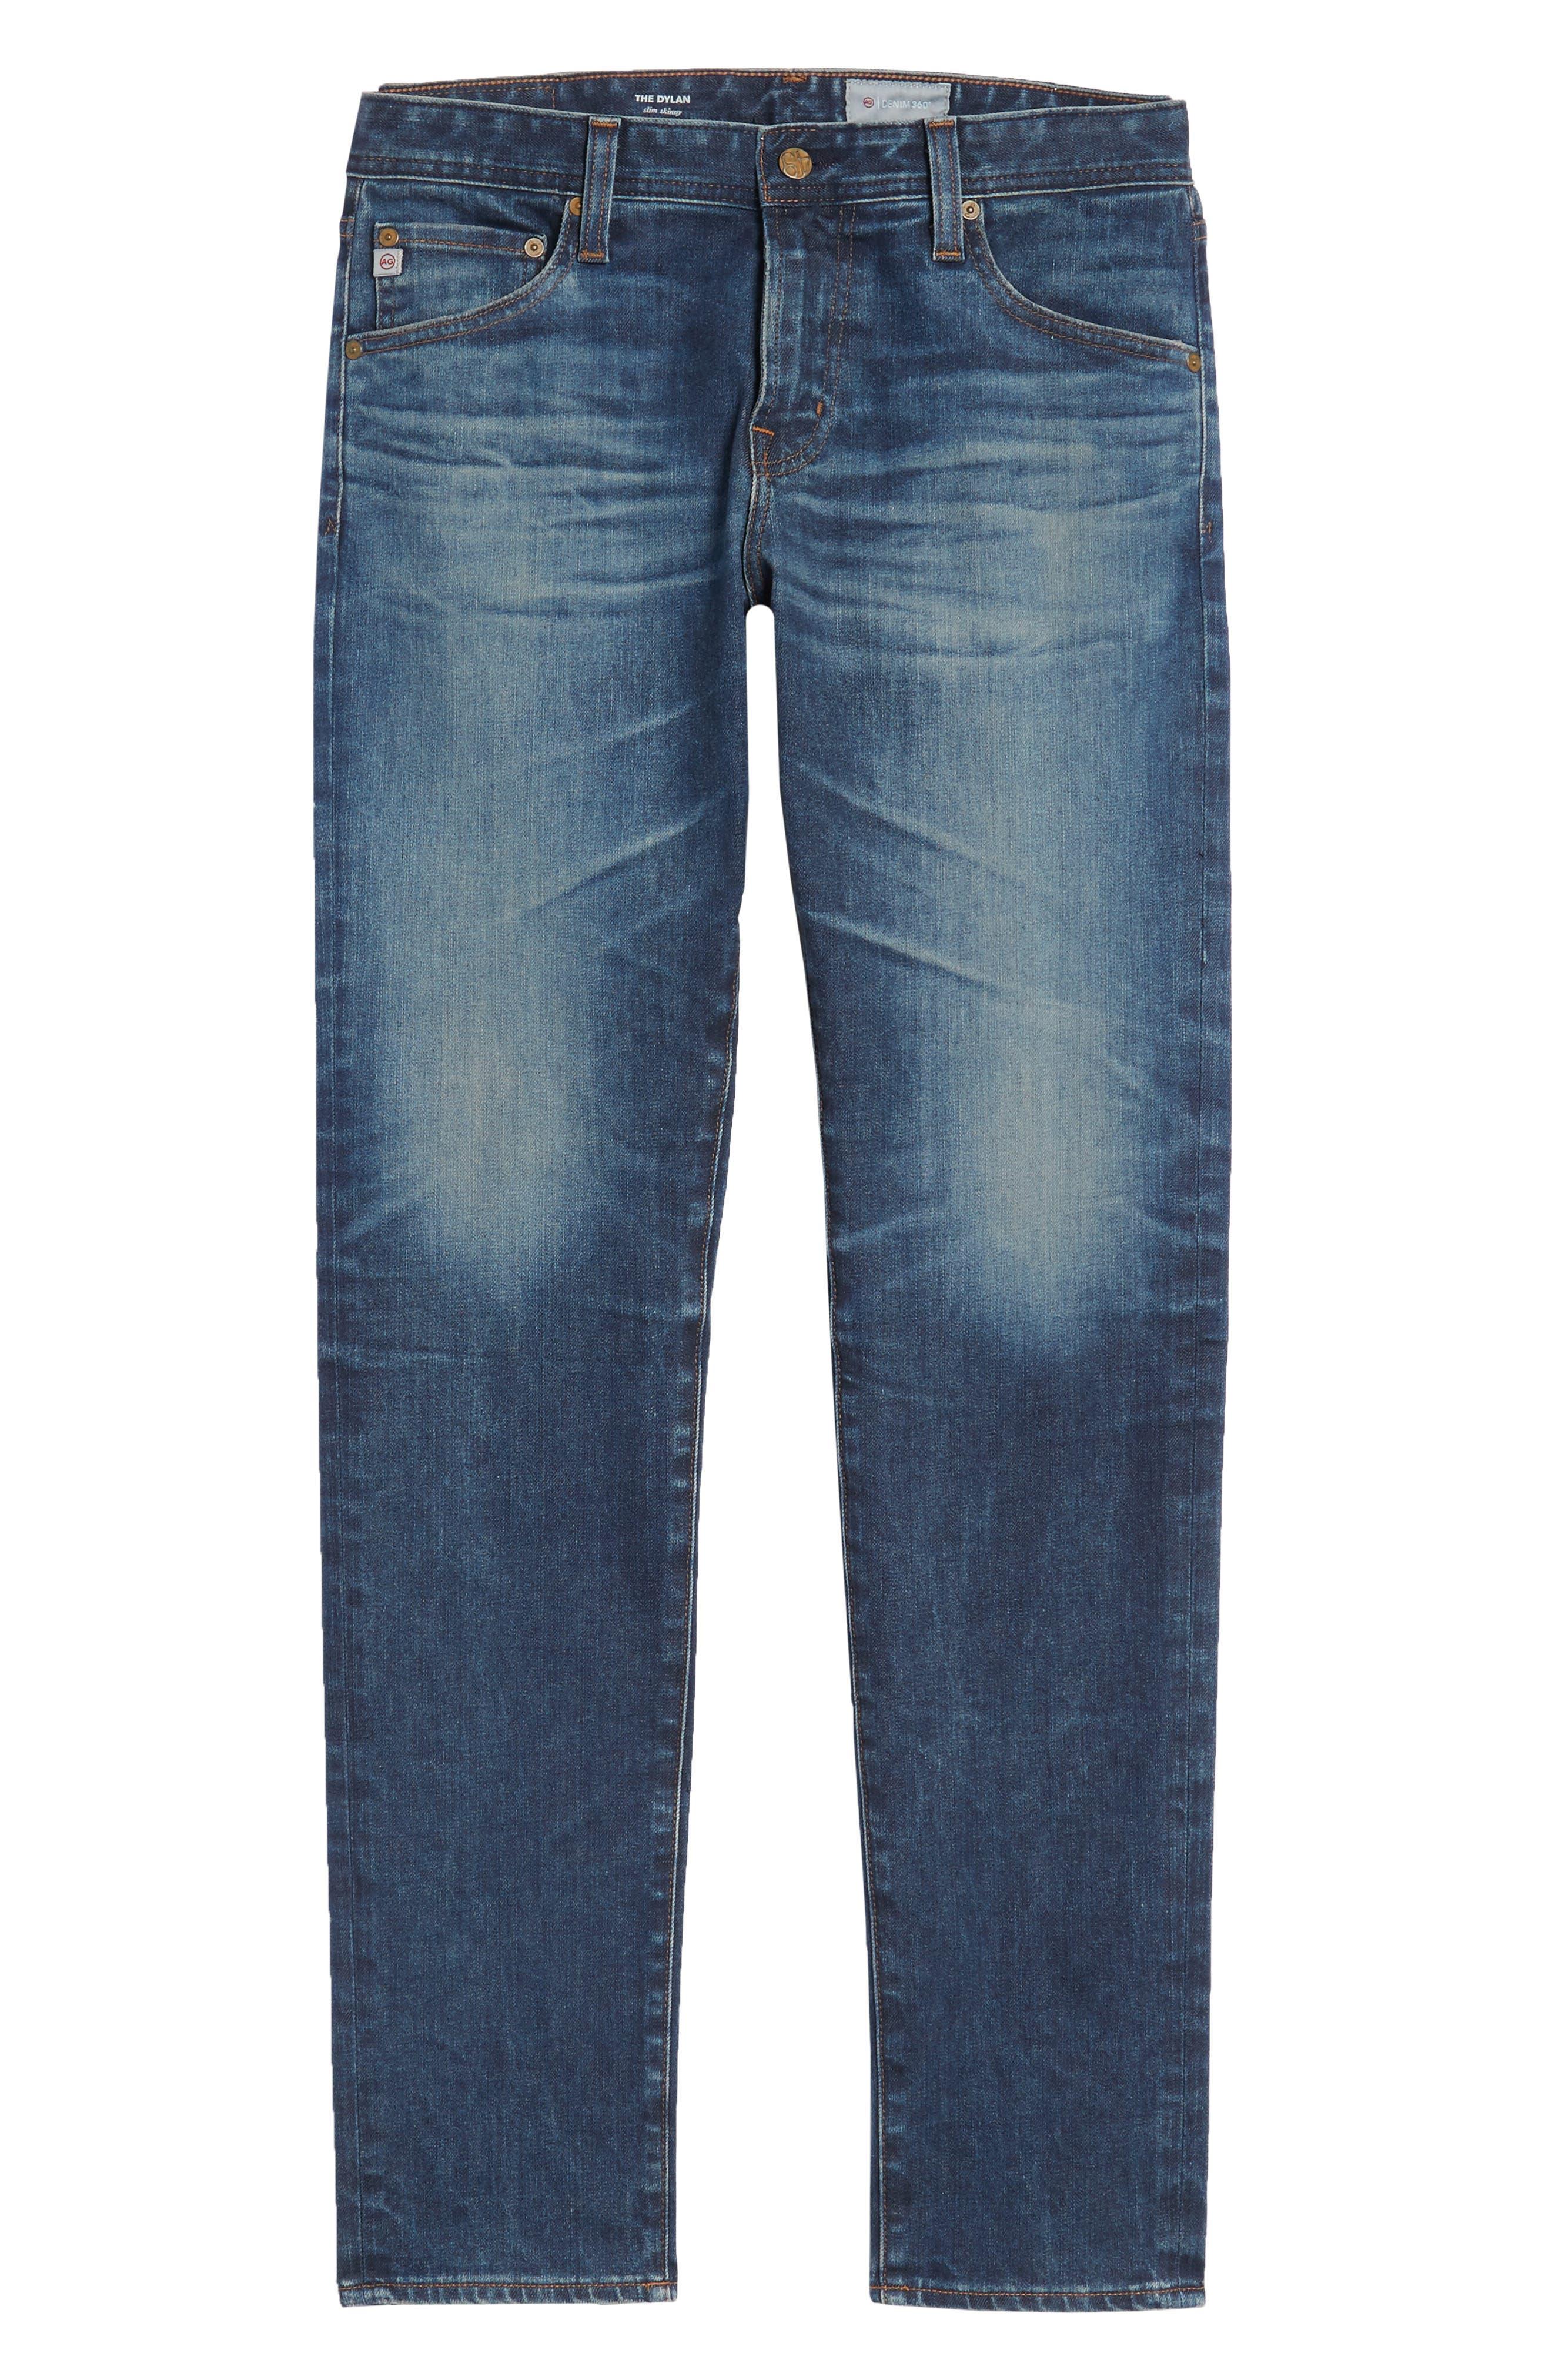 Dylan Slim Skinny Fit Jeans,                             Alternate thumbnail 6, color,                             451